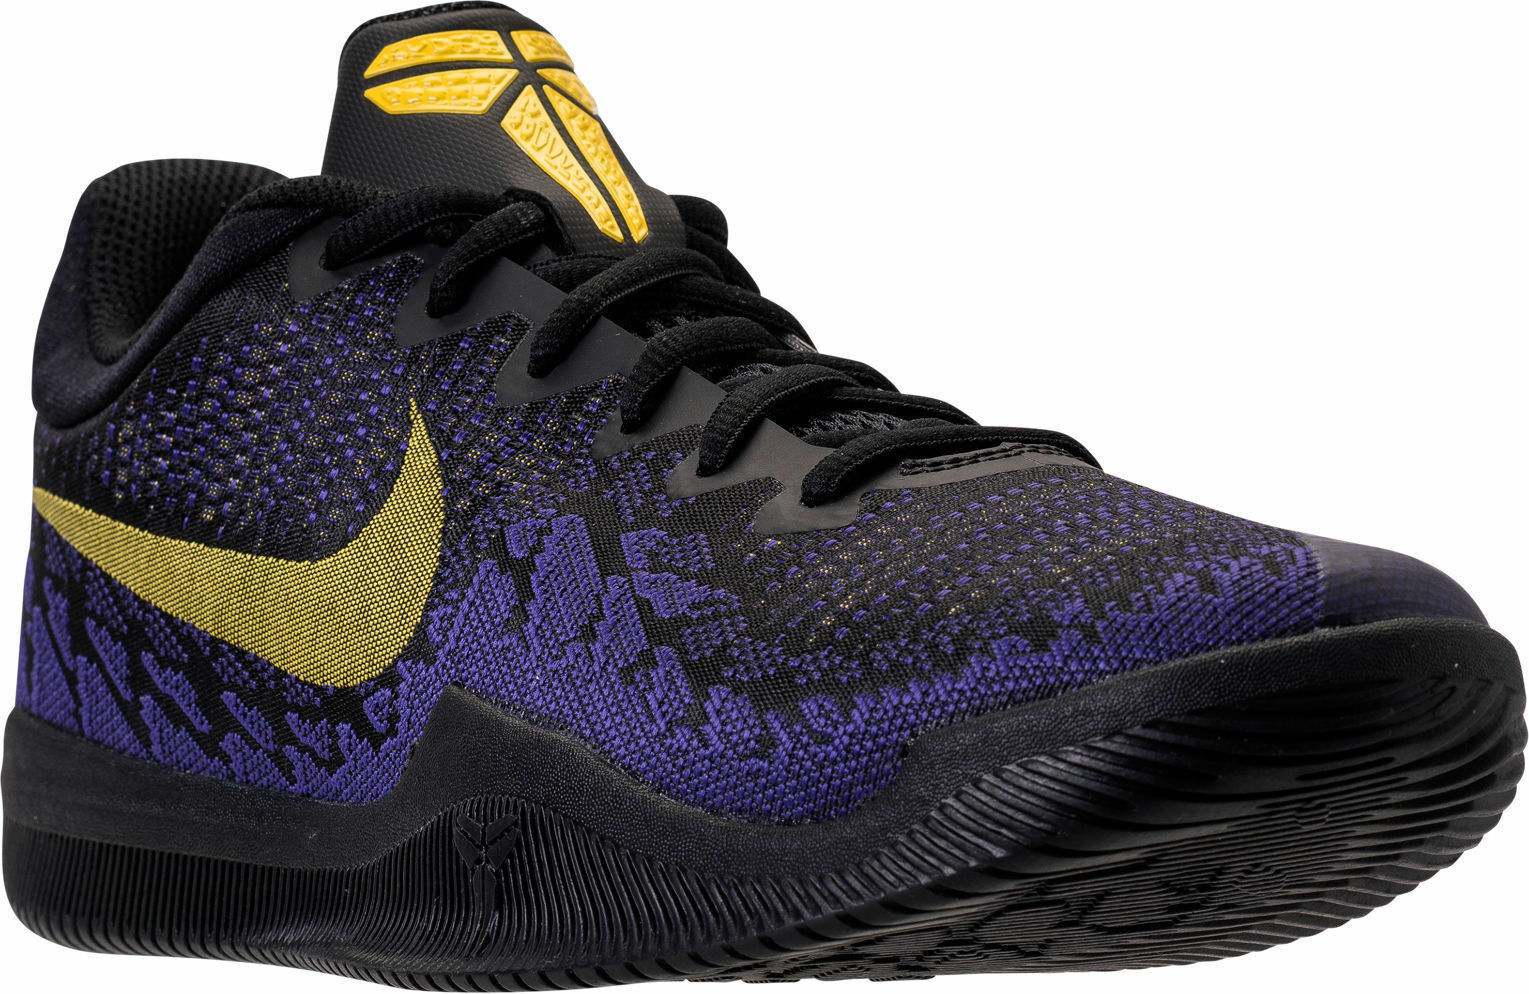 8f763159ae Men's Nike Nike Nike Kobe Mamba Rage Black Tour Yellow Purple Sizes 8-13 NIB